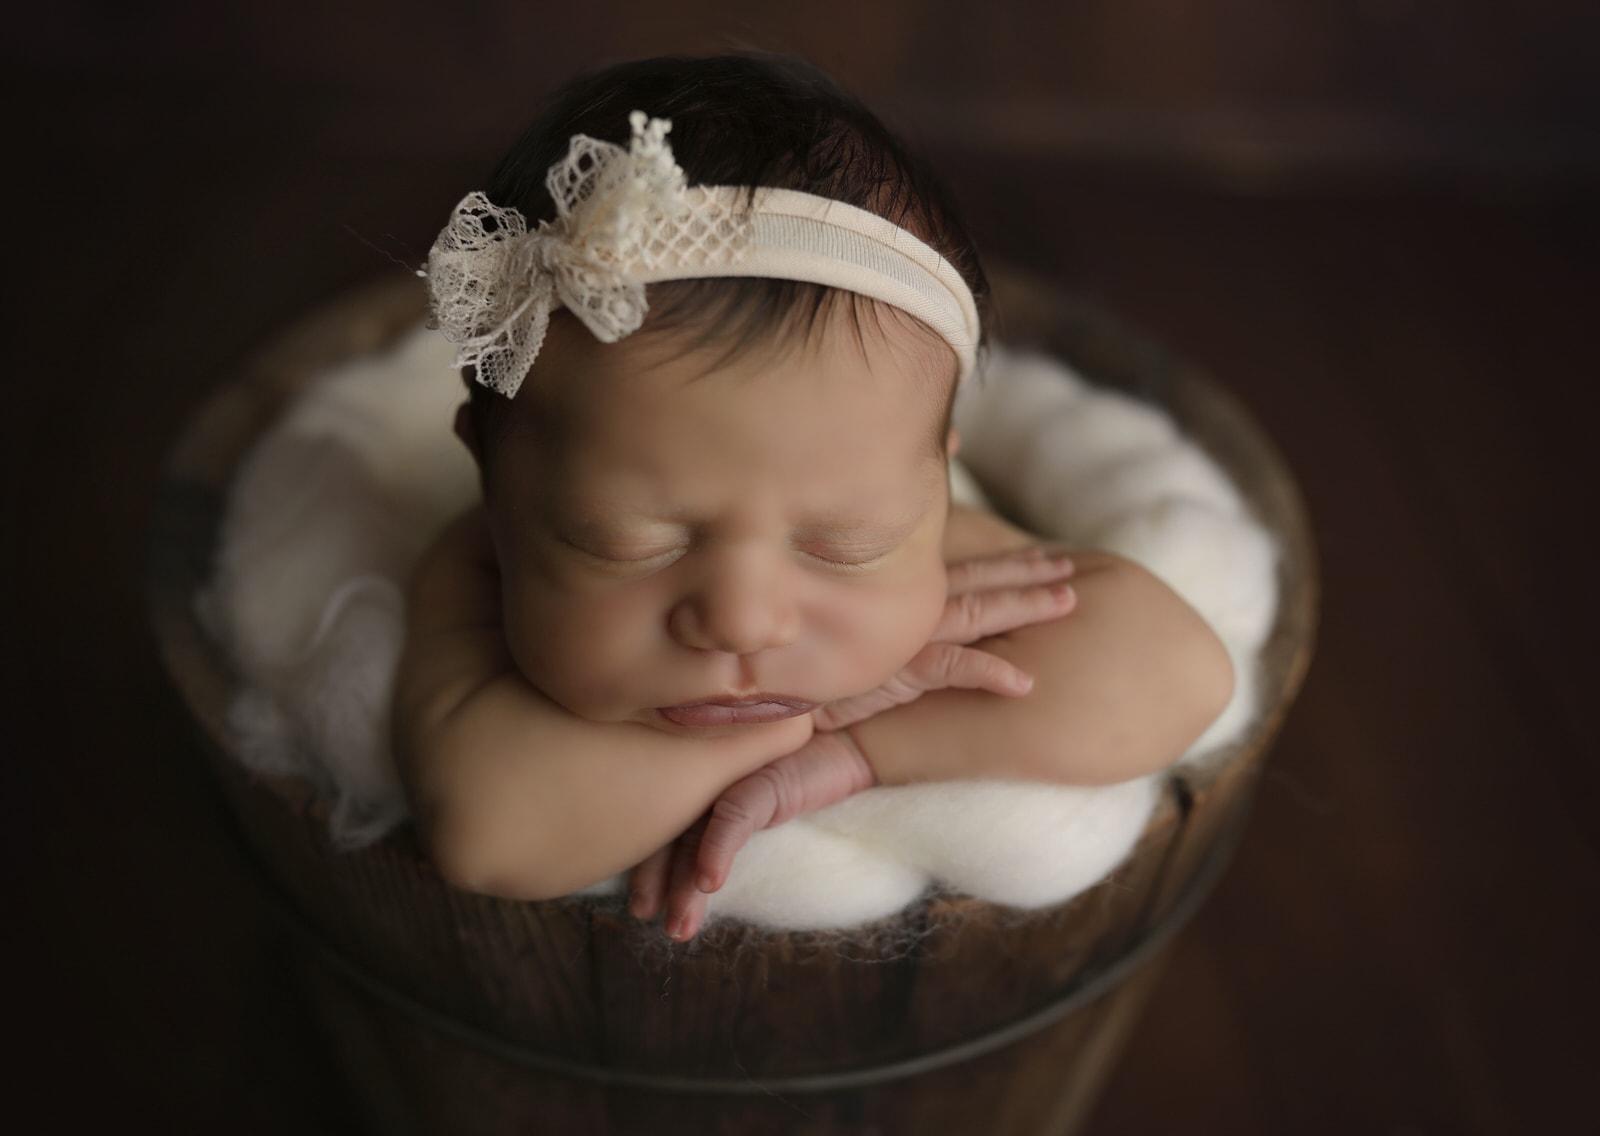 newborn baby sleeps in bucket during her newborn photoshoot in harrisburg pa